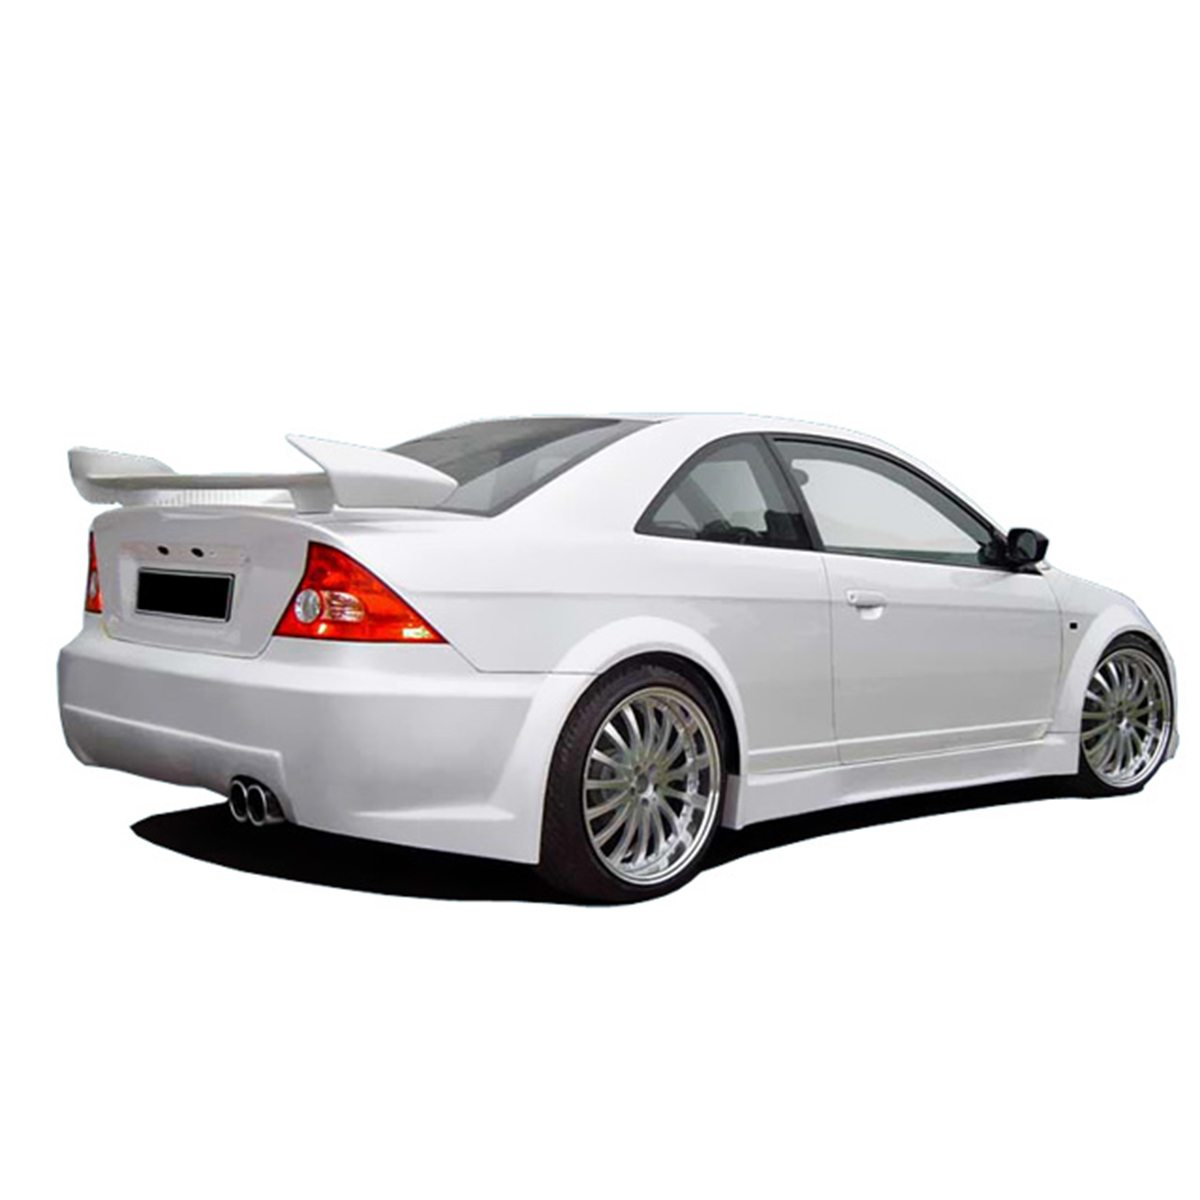 Honda-Civic-01-Coupe-LKA-Tras-PCS096